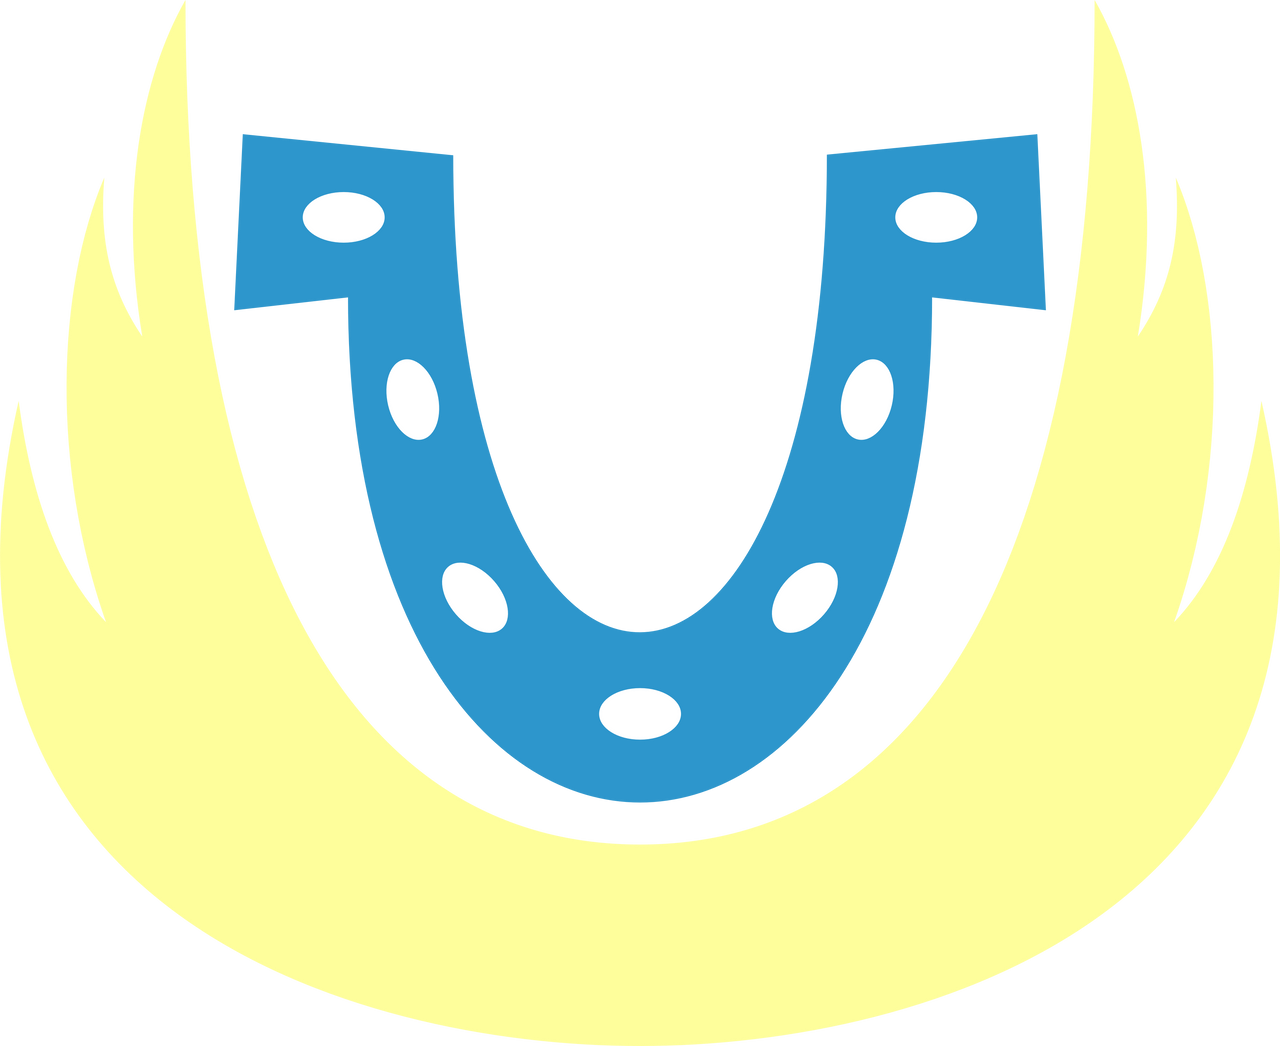 trinet logo vector yOCS